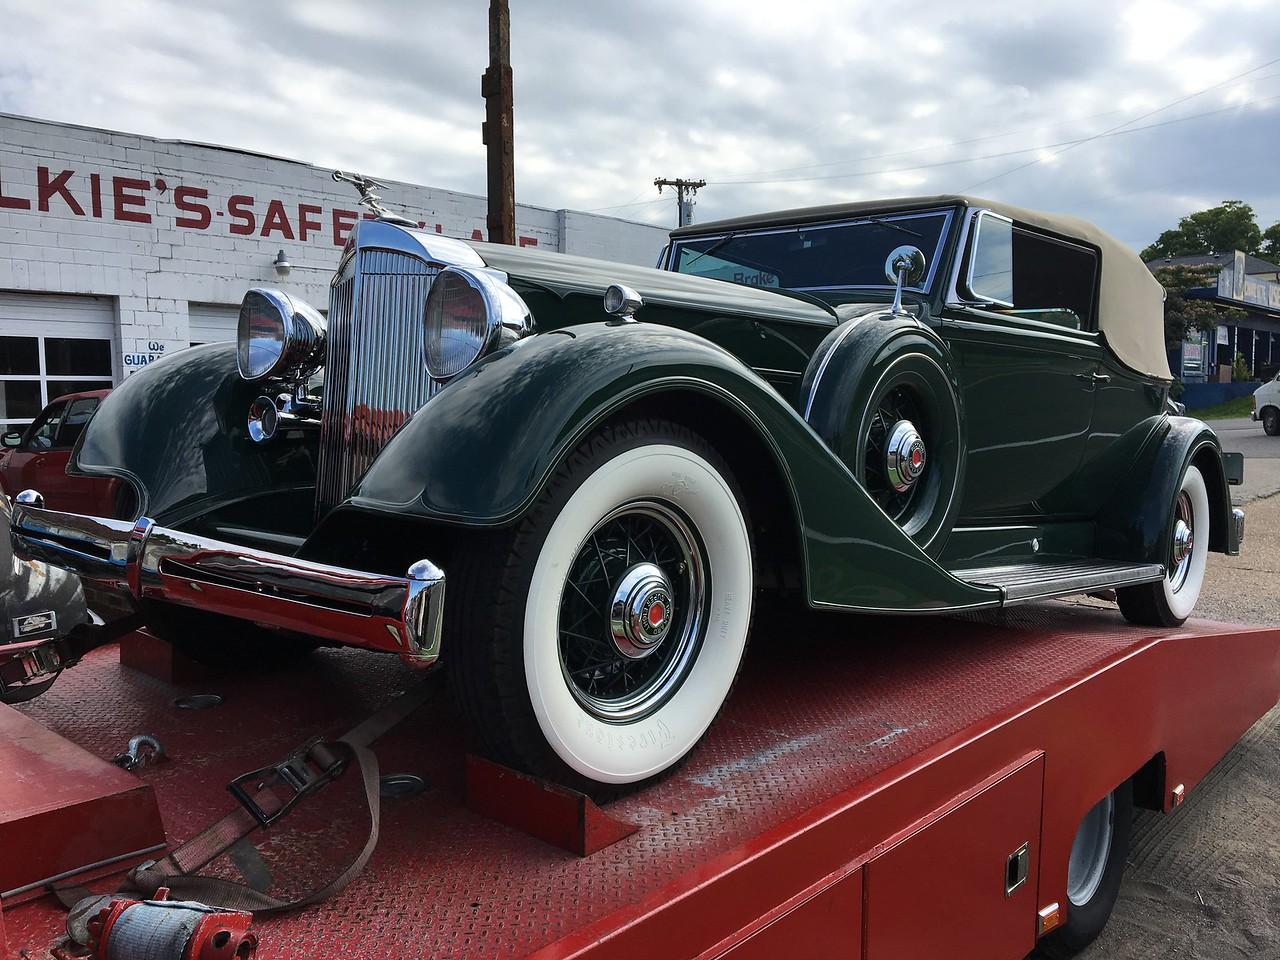 1934 Packard Victoria Super Eight Dietrich (Nashville, Tennessee to Keeneland Concours, Lexington, Kentucky)